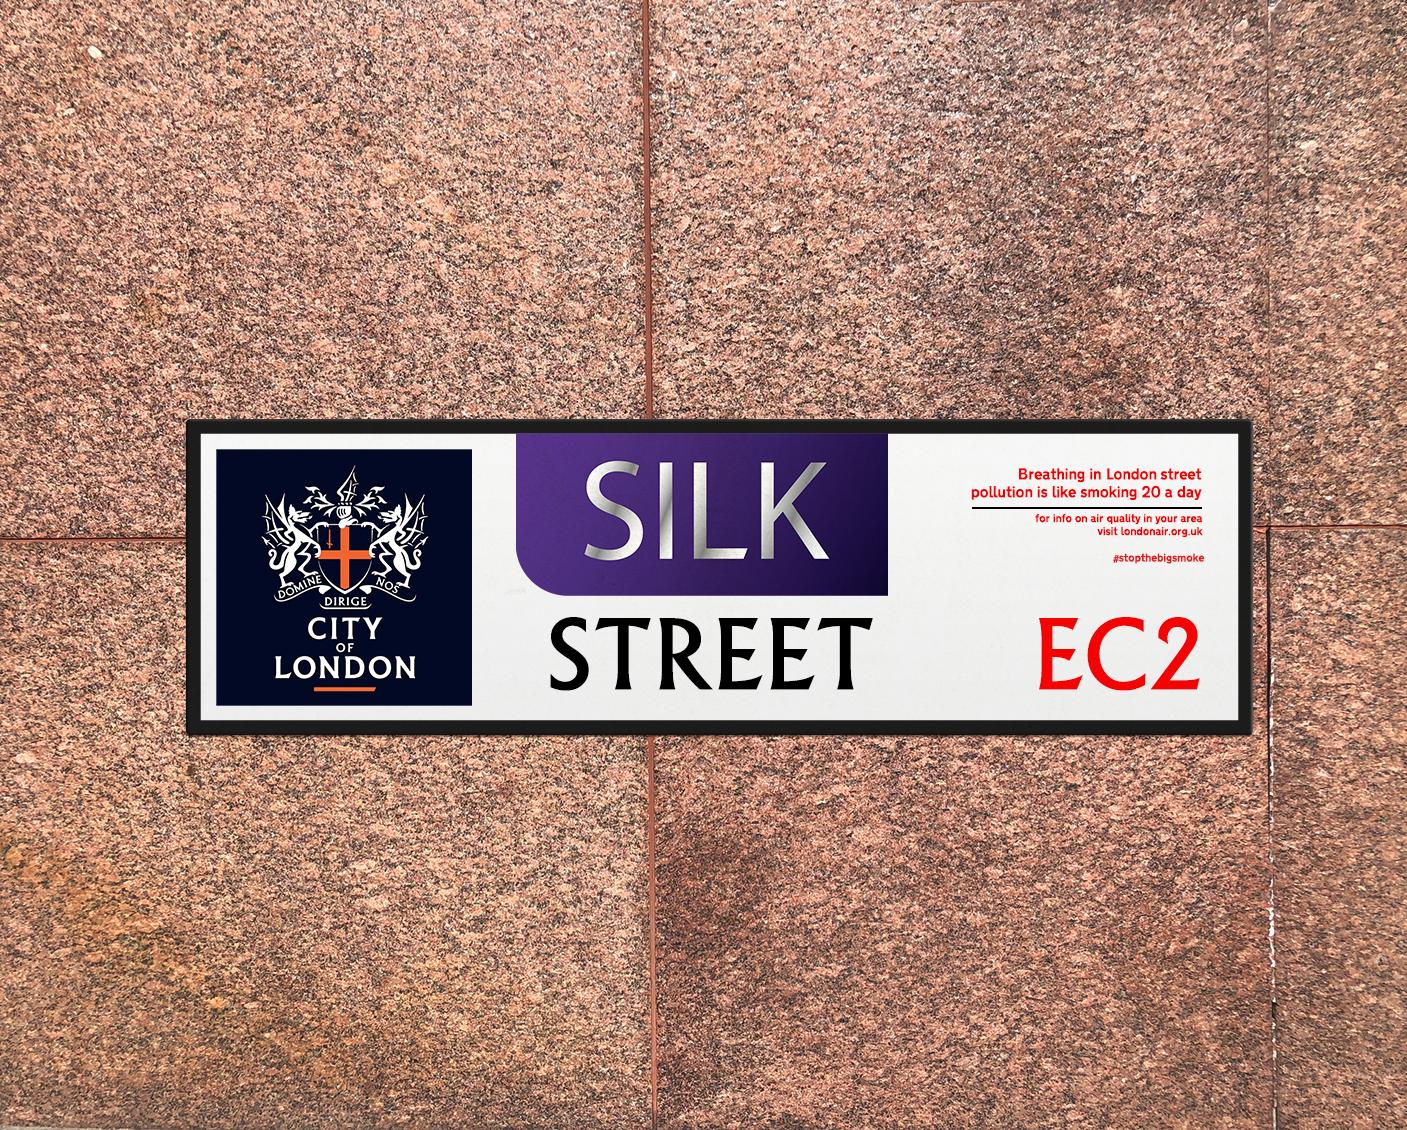 Silk Street, EC2